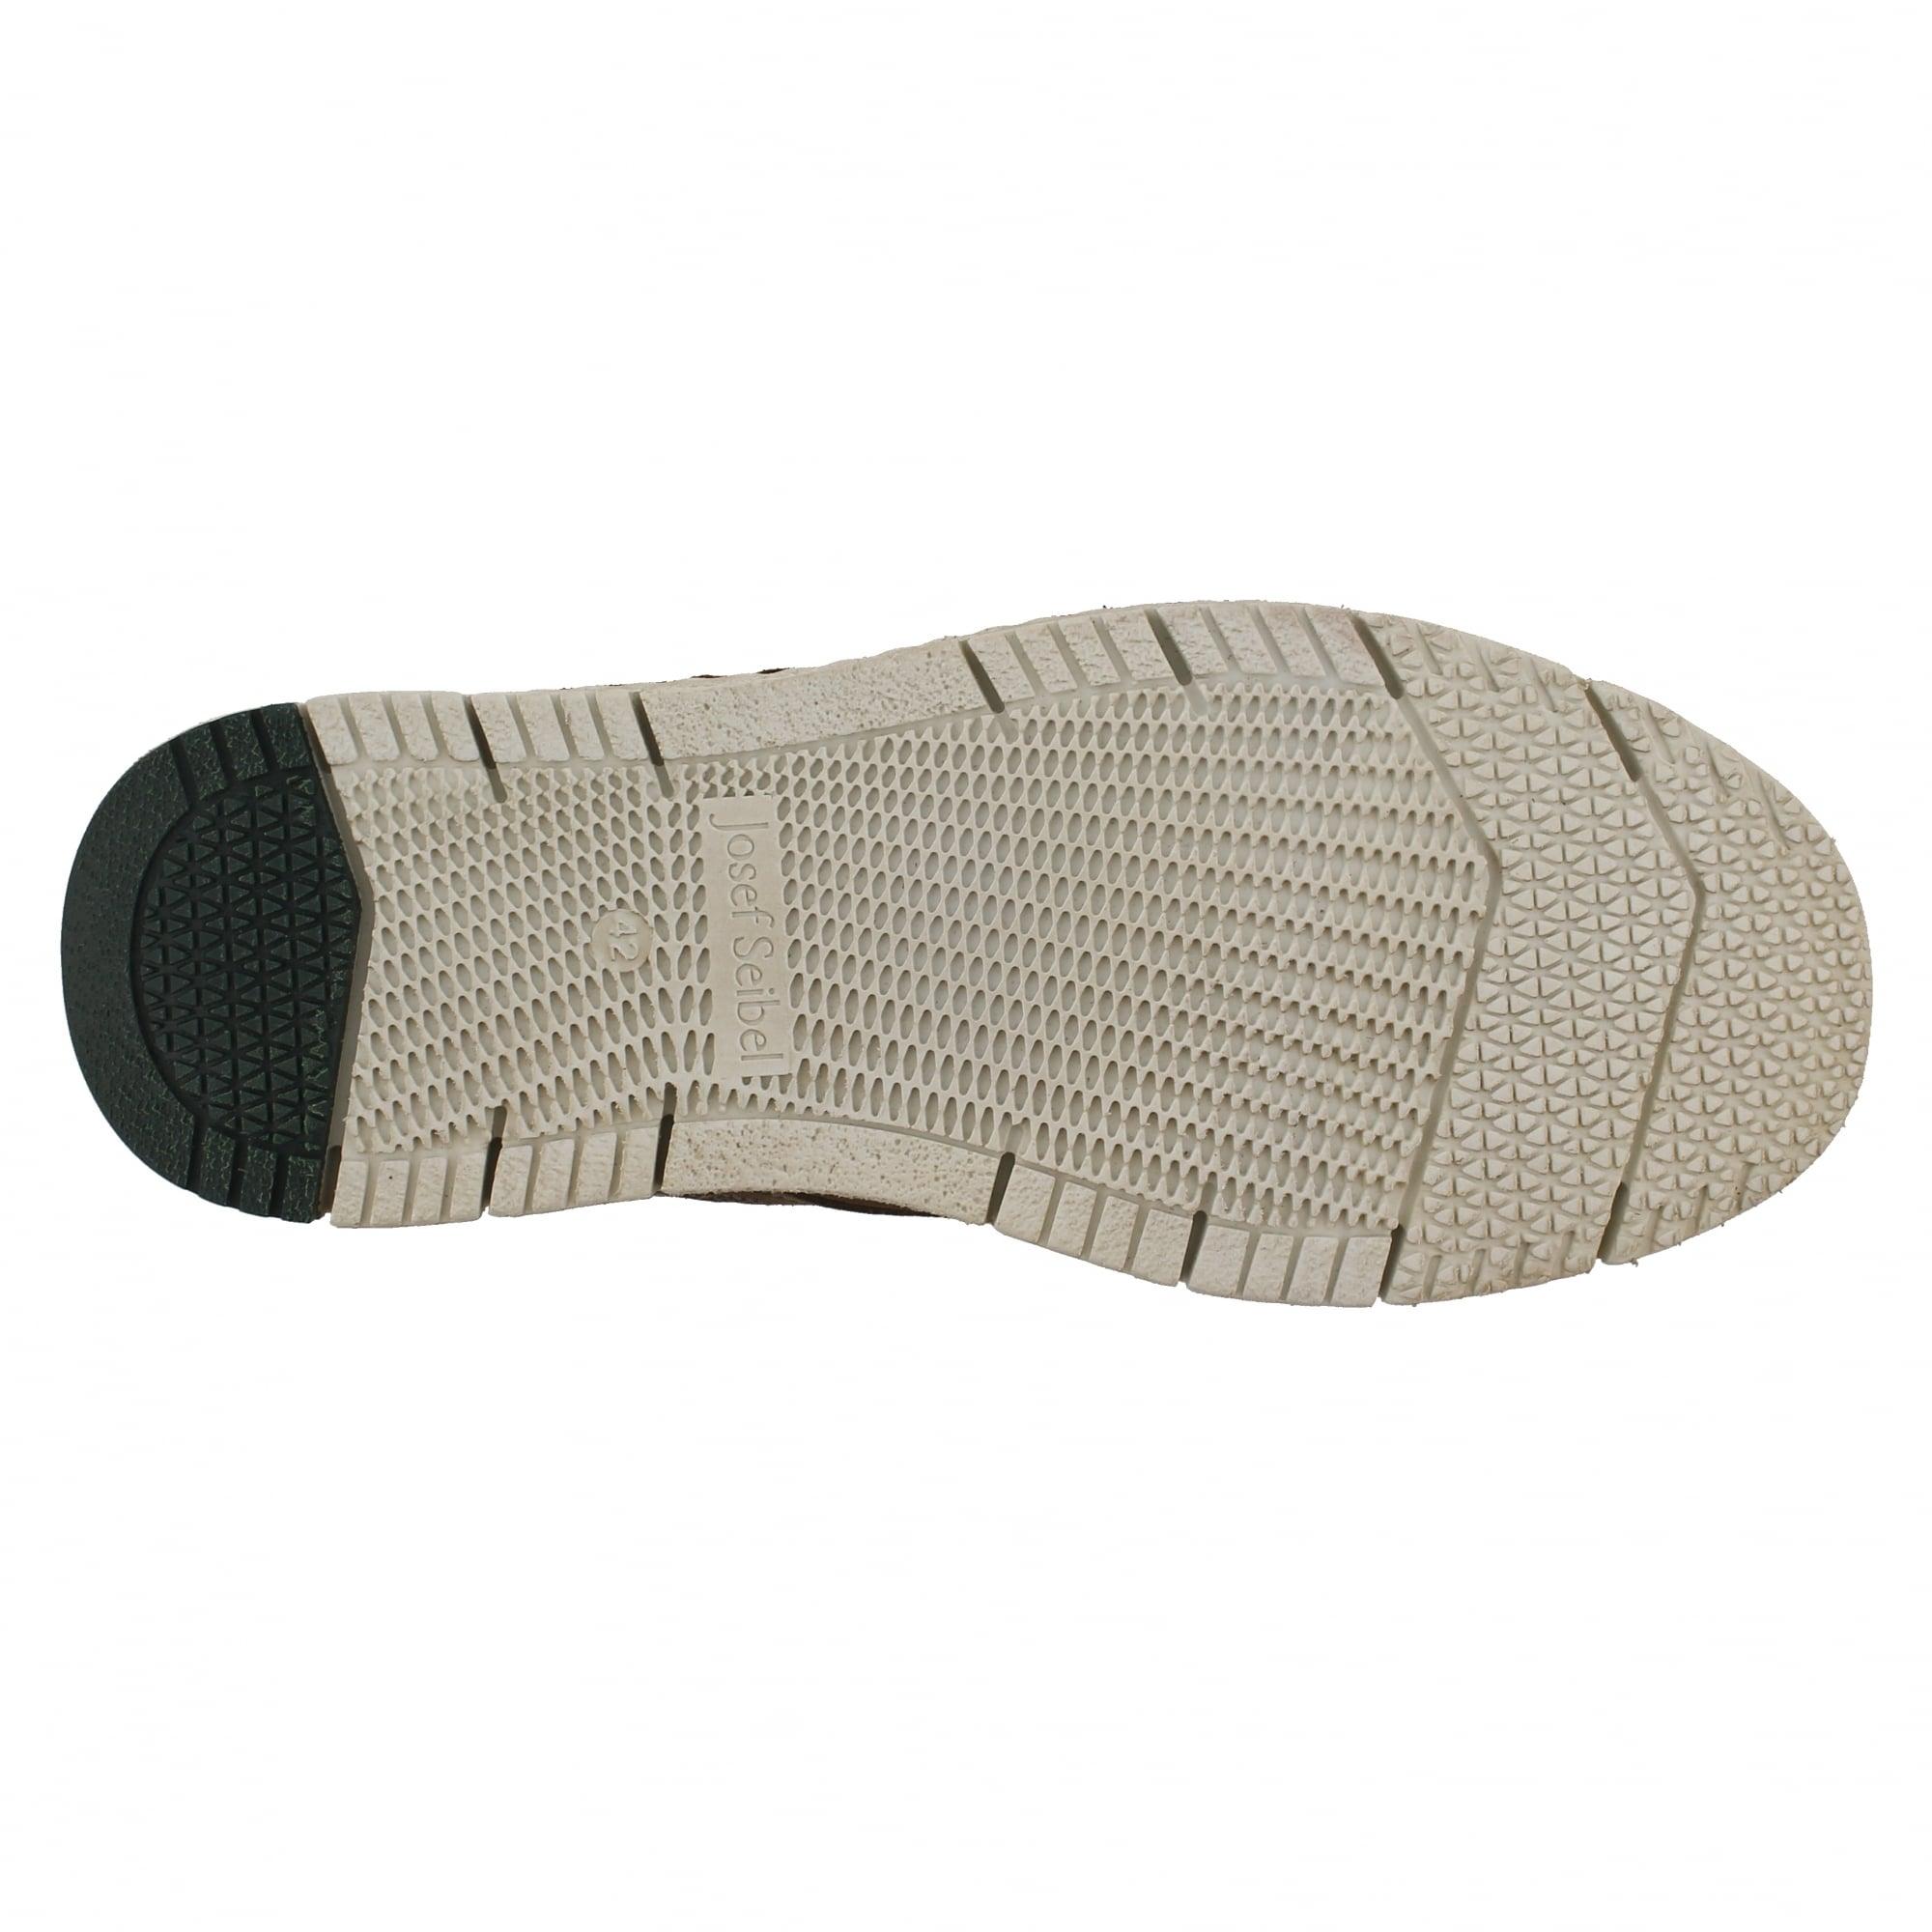 b4ef24d4a72bd Josef Seibel Ruben 1 Taupe Suede Mens Lace Up Shoes | Rogerson Shoes